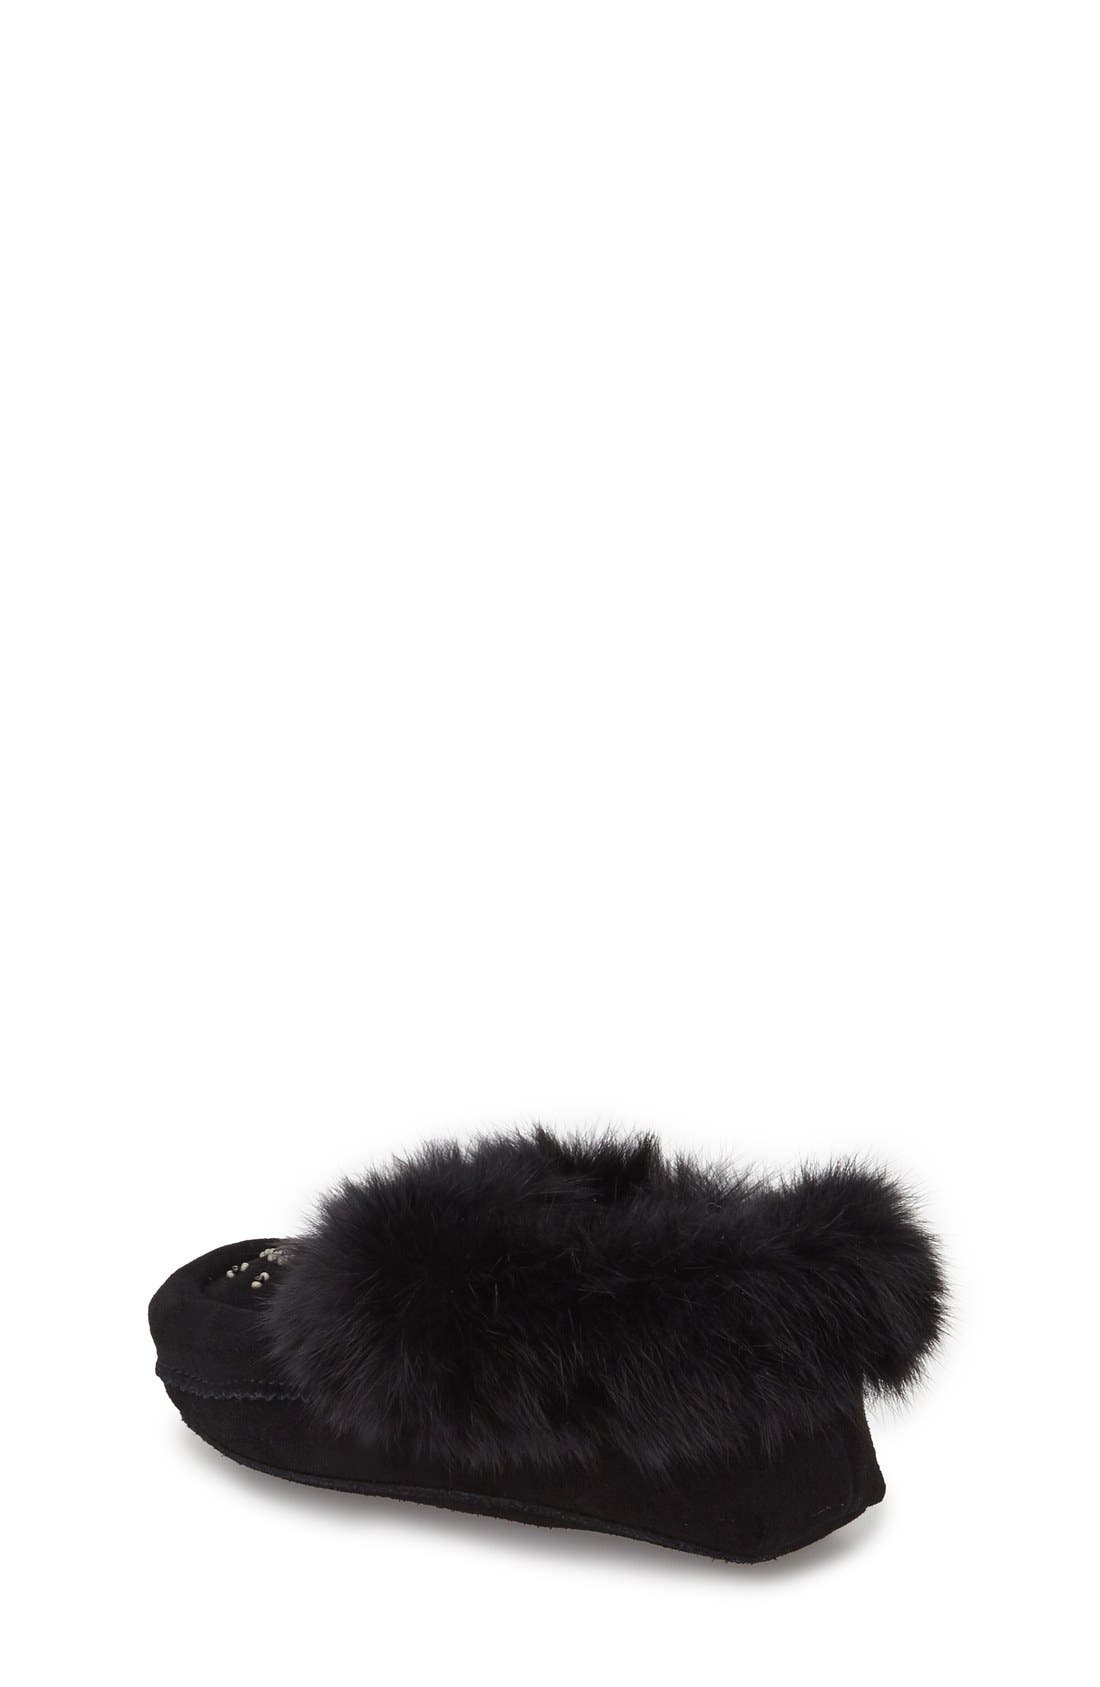 Genuine Rabbit Fur Moccasin,                             Alternate thumbnail 3, color,                             BLACK SUEDE